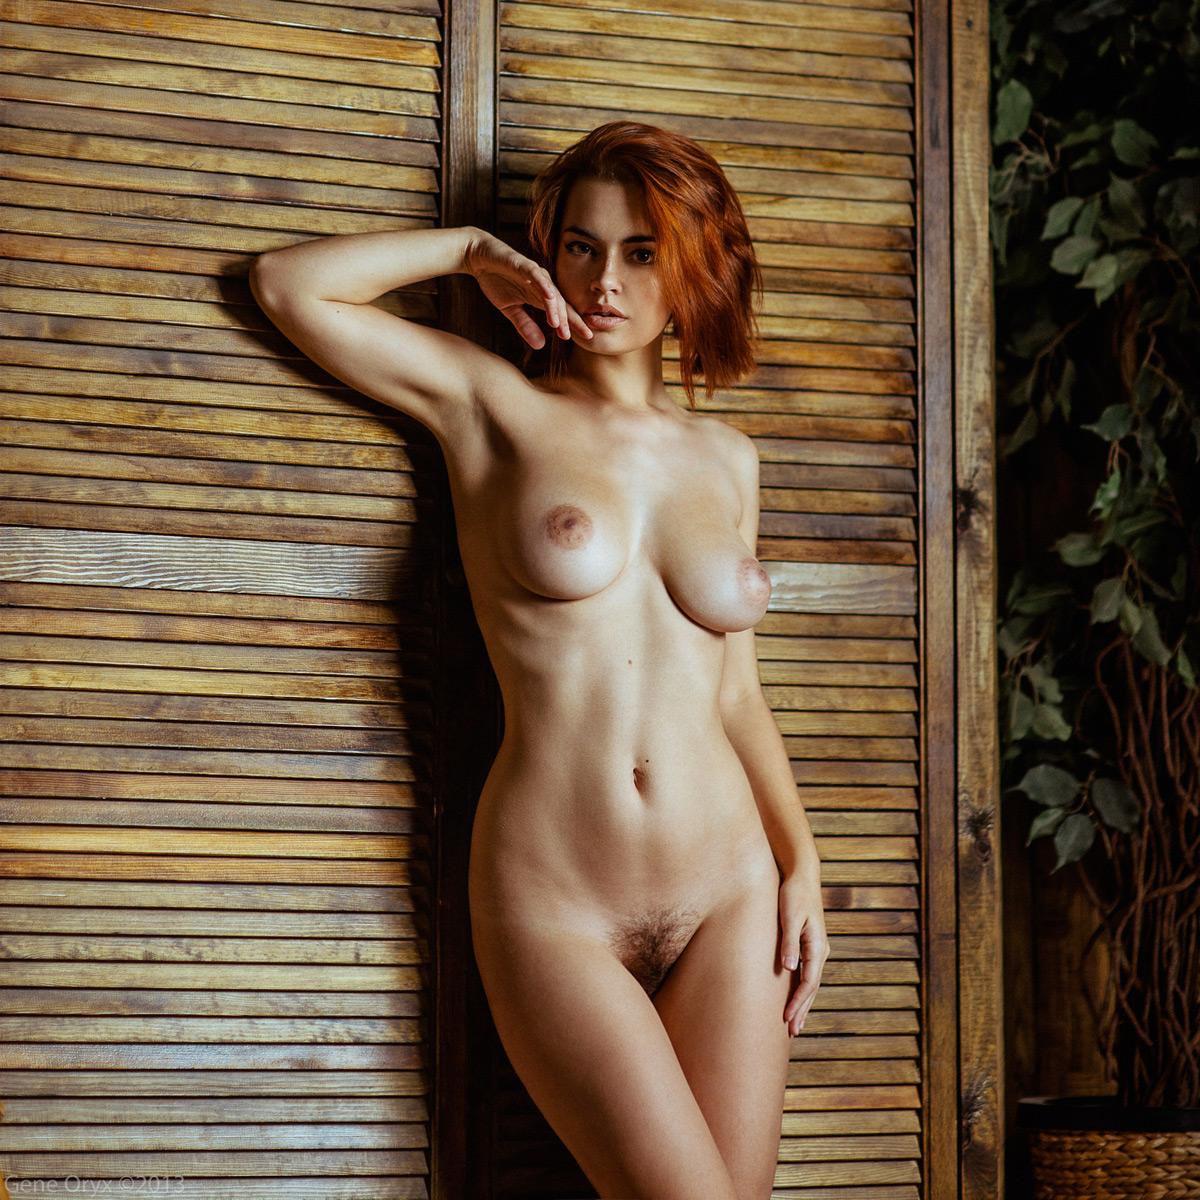 https://img-fotki.yandex.ru/get/5006/330286383.64/0_1623e0_66777618_orig.jpg